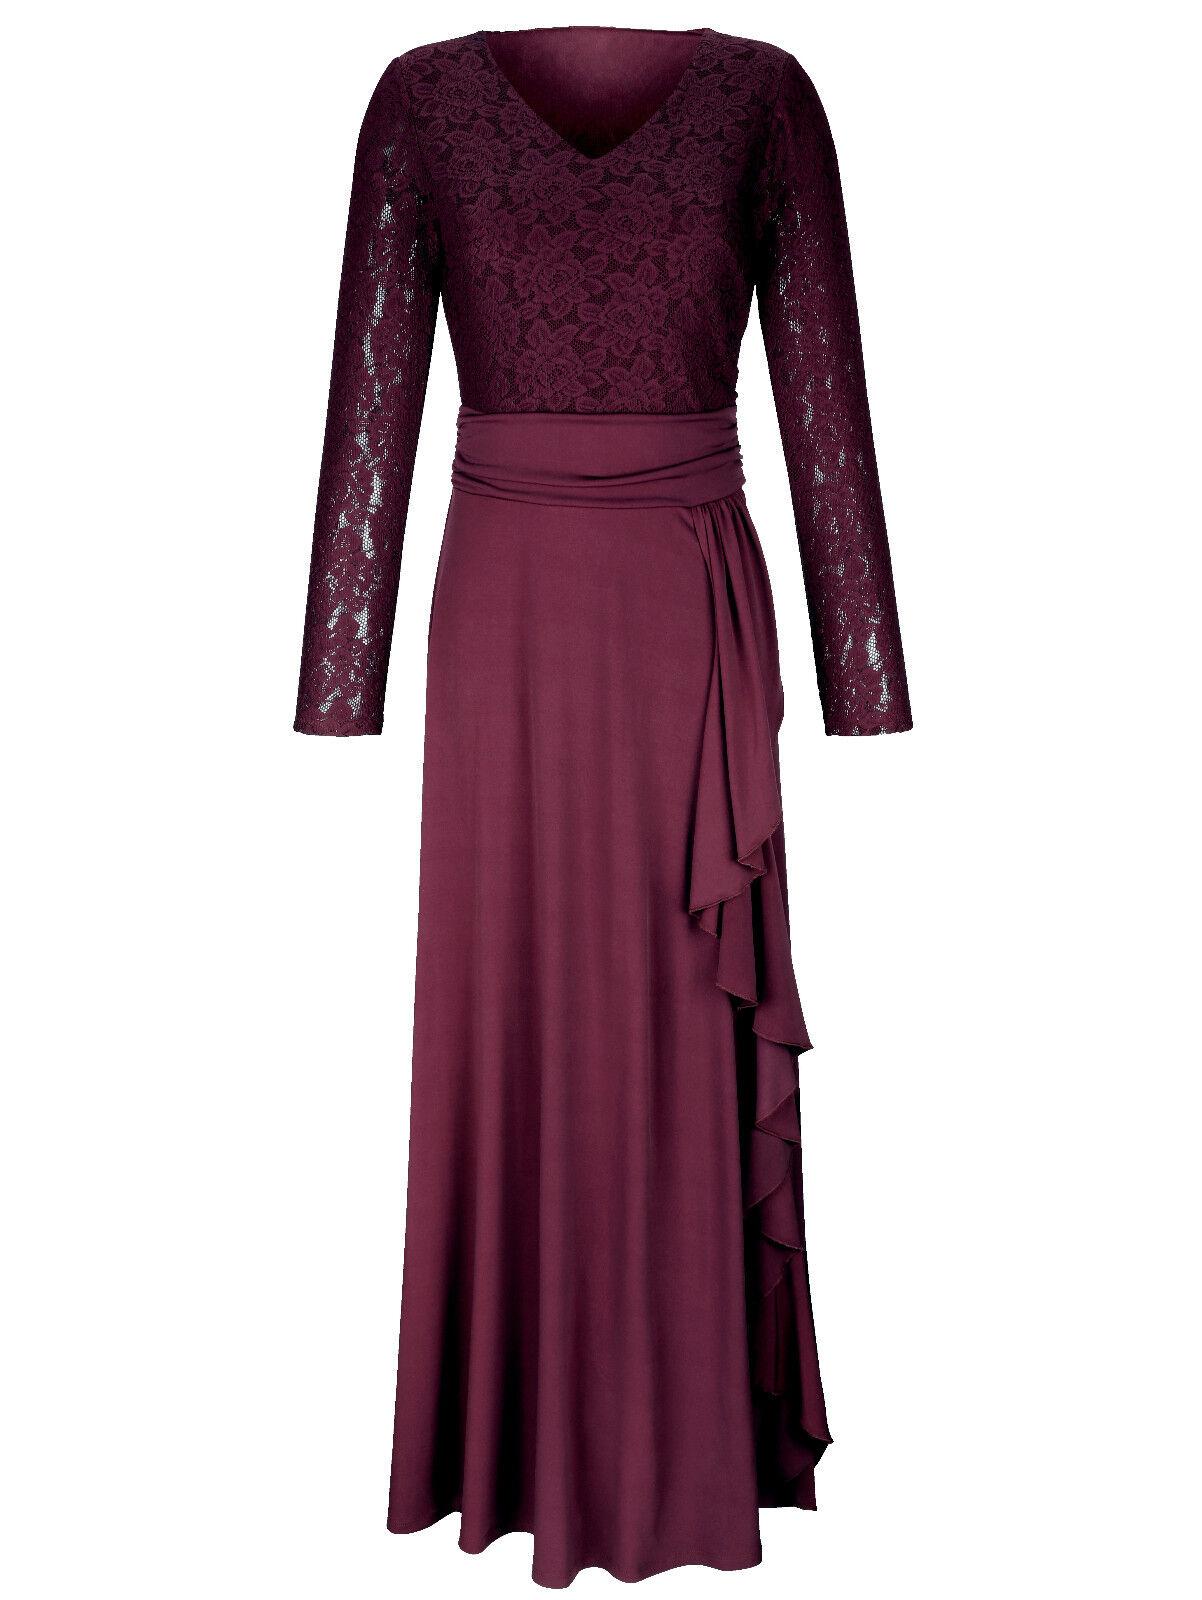 Top Marken langes langes langes Spitzen Kleid beere Gr. 42, Gr, 44, Gr. 46, Gr. 48 1118336293 | Sale  | Sonderkauf  12c98f